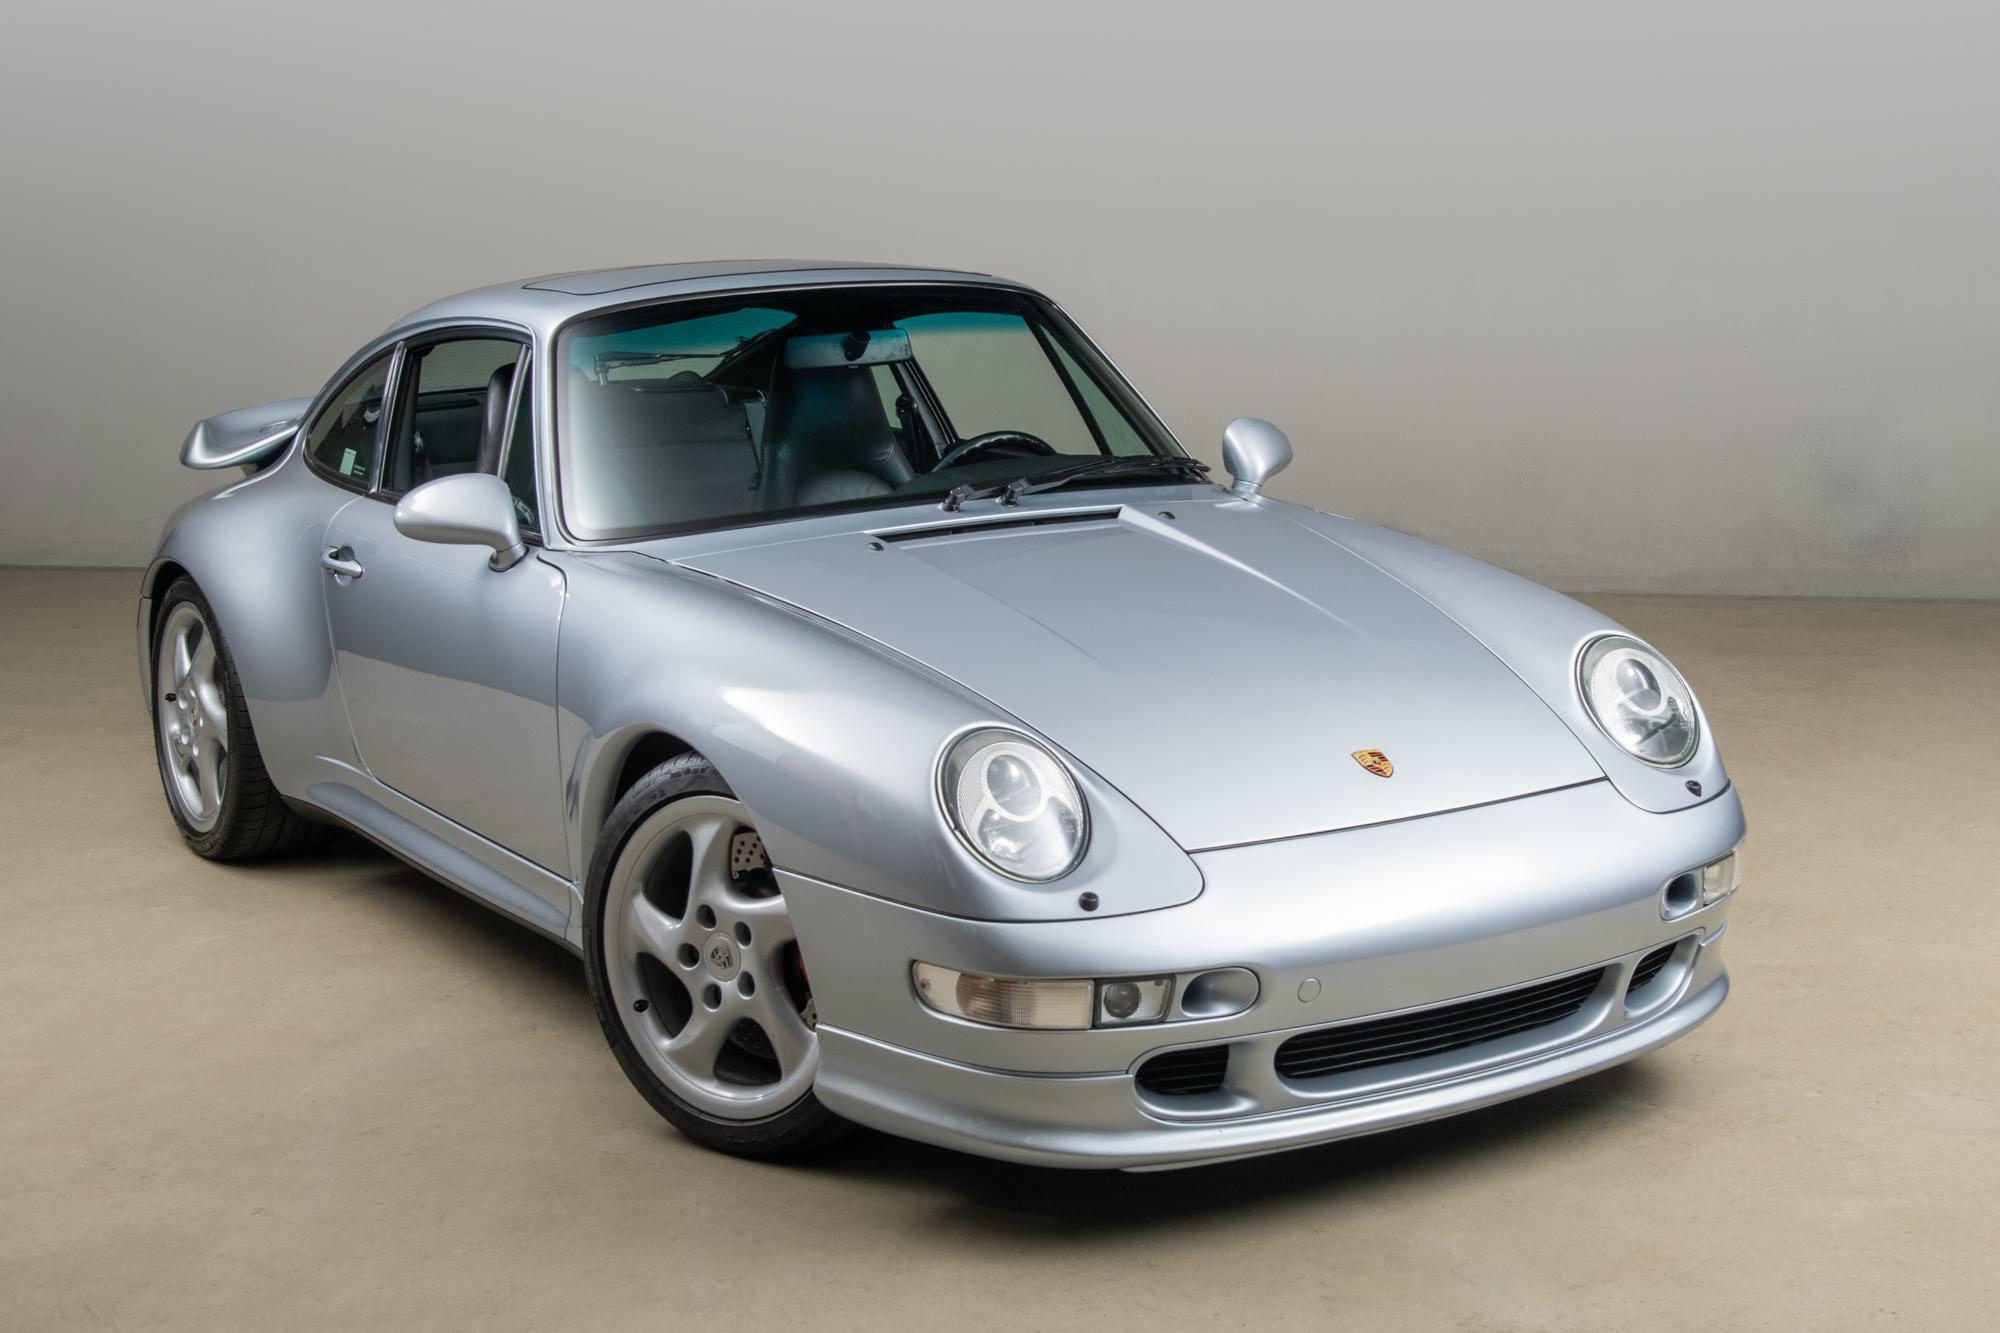 1996 ANDIAL Porsche 993 Turbo , POLAR SILVER, VIN WP0AC2990TS375274, MILEAGE 33493